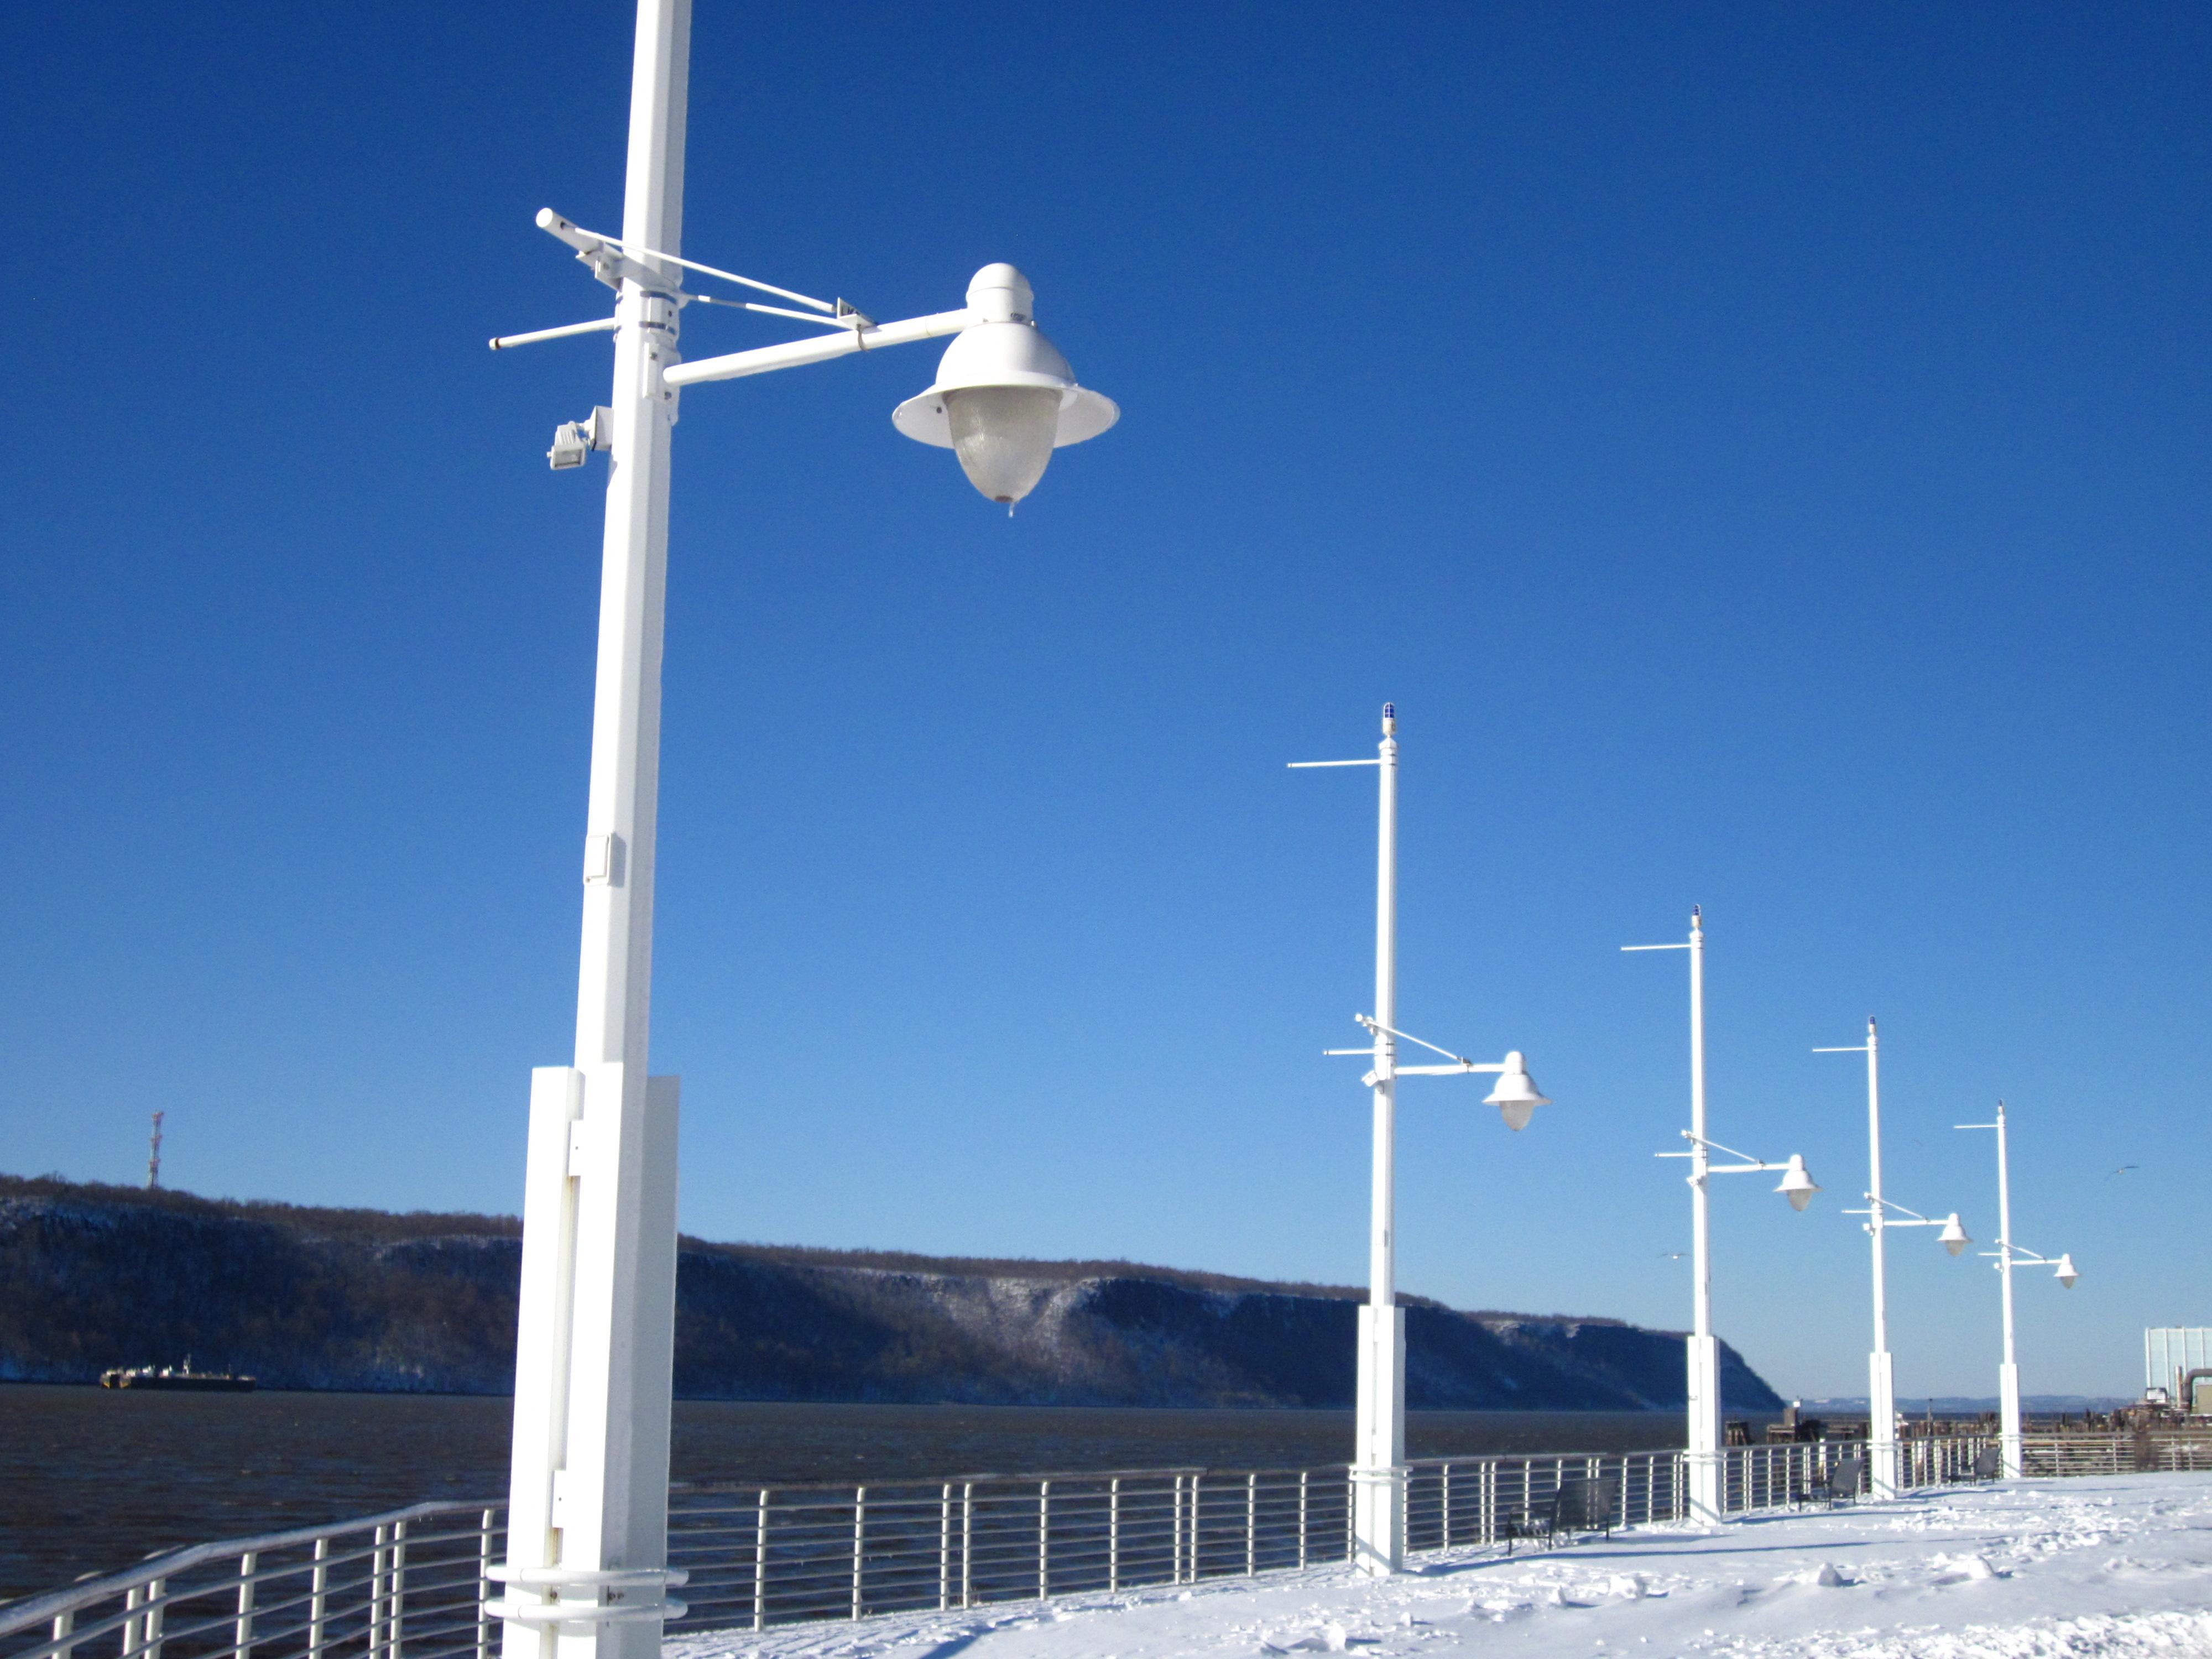 Polar Poles